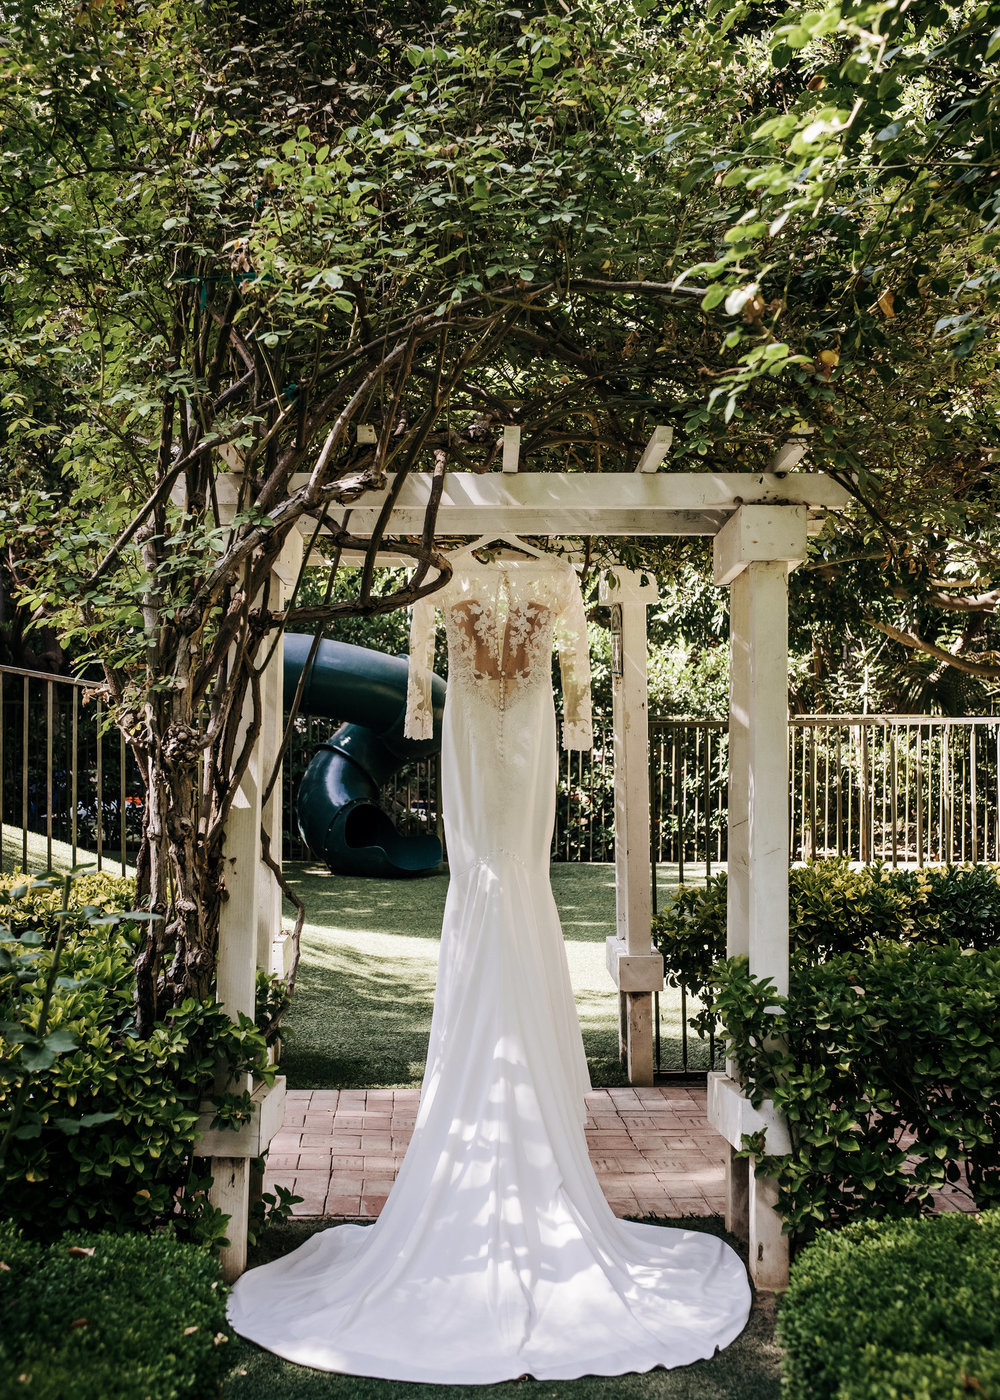 Turchin_20180825_Austinae-Brent-Wedding_058.jpg